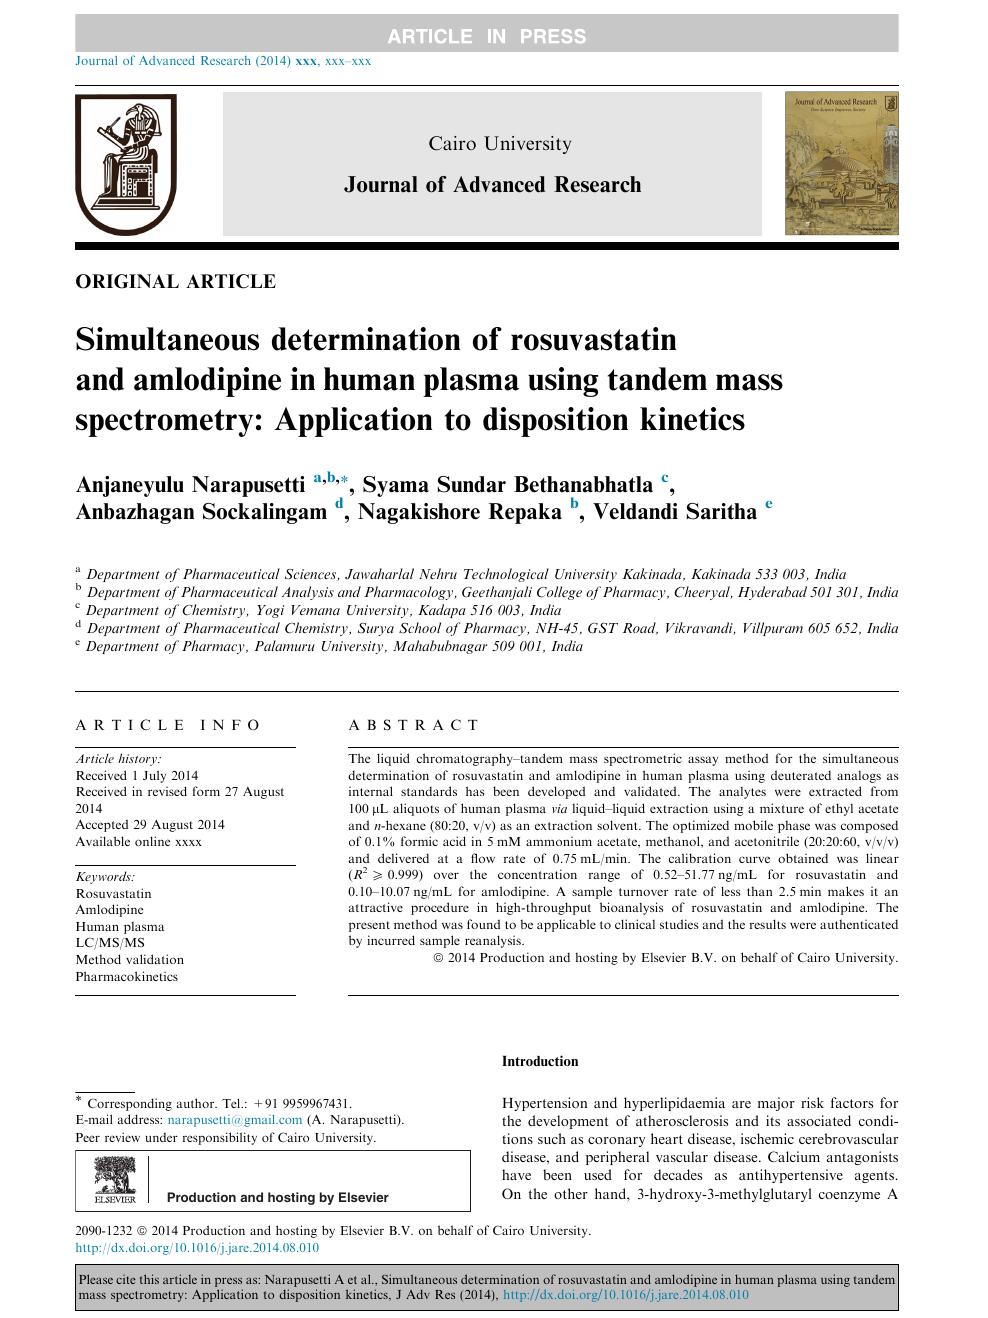 Simultaneous determination of rosuvastatin and amlodipine in